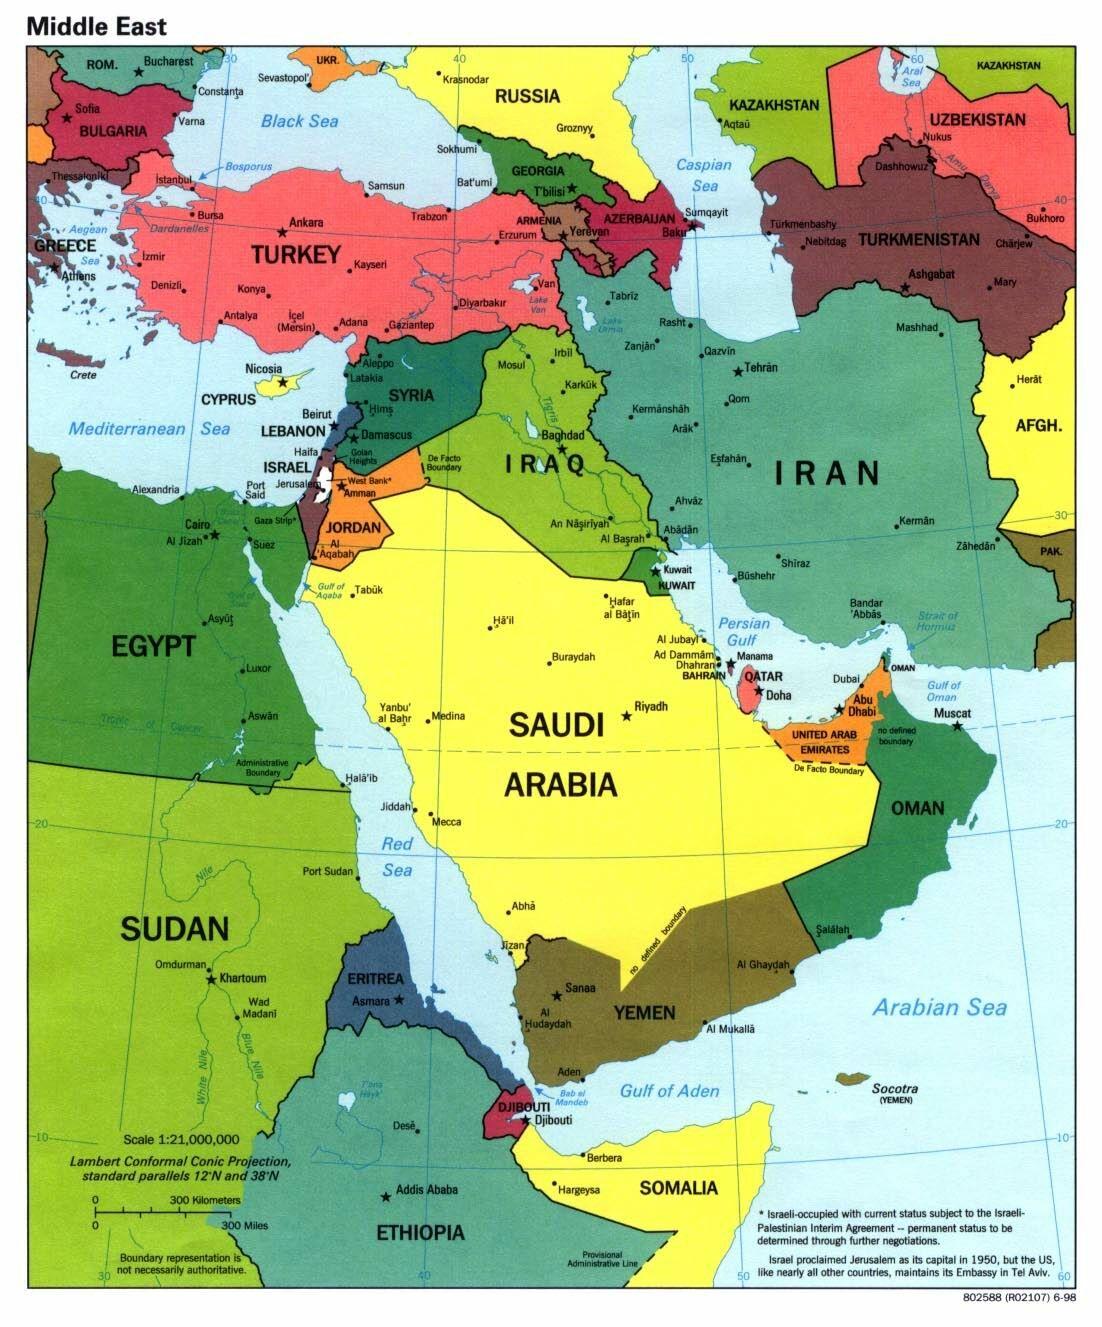 mapa-medio-oriente